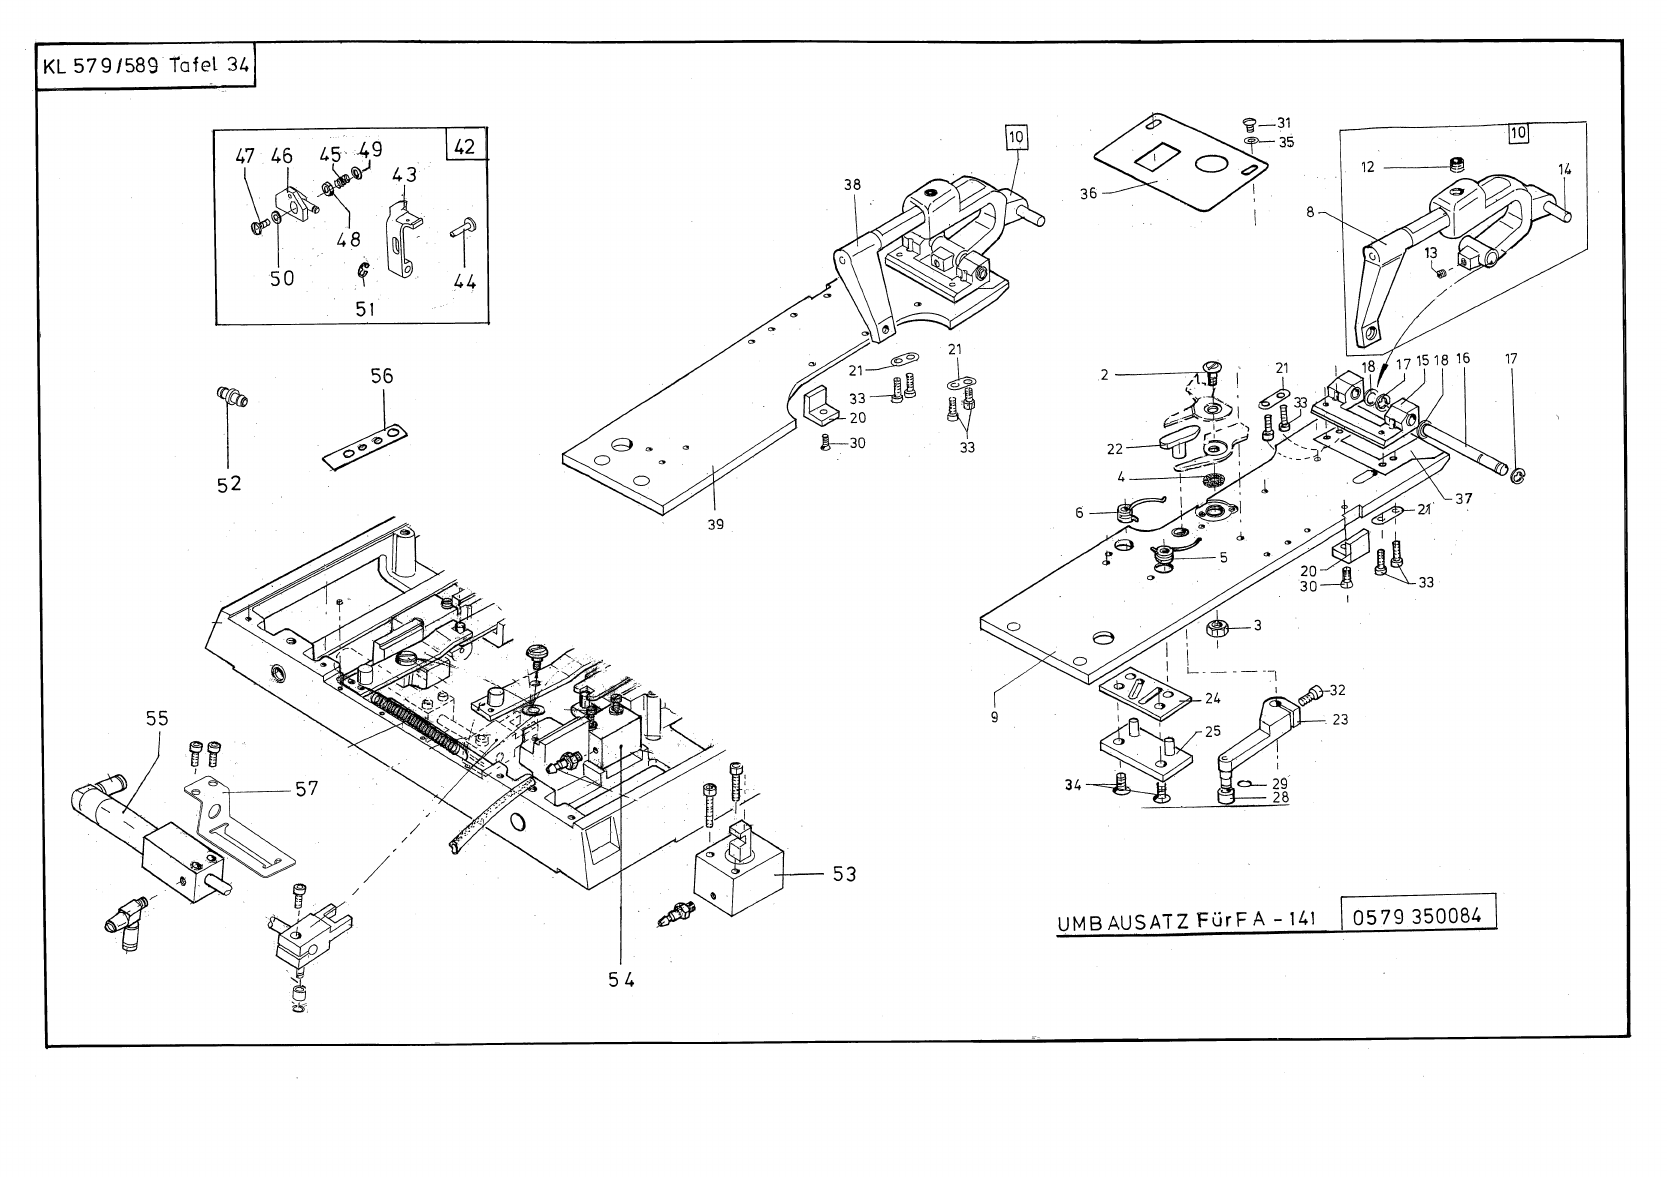 ACE&EASTMAN Durkopp 579 589 PrintTable User Manual